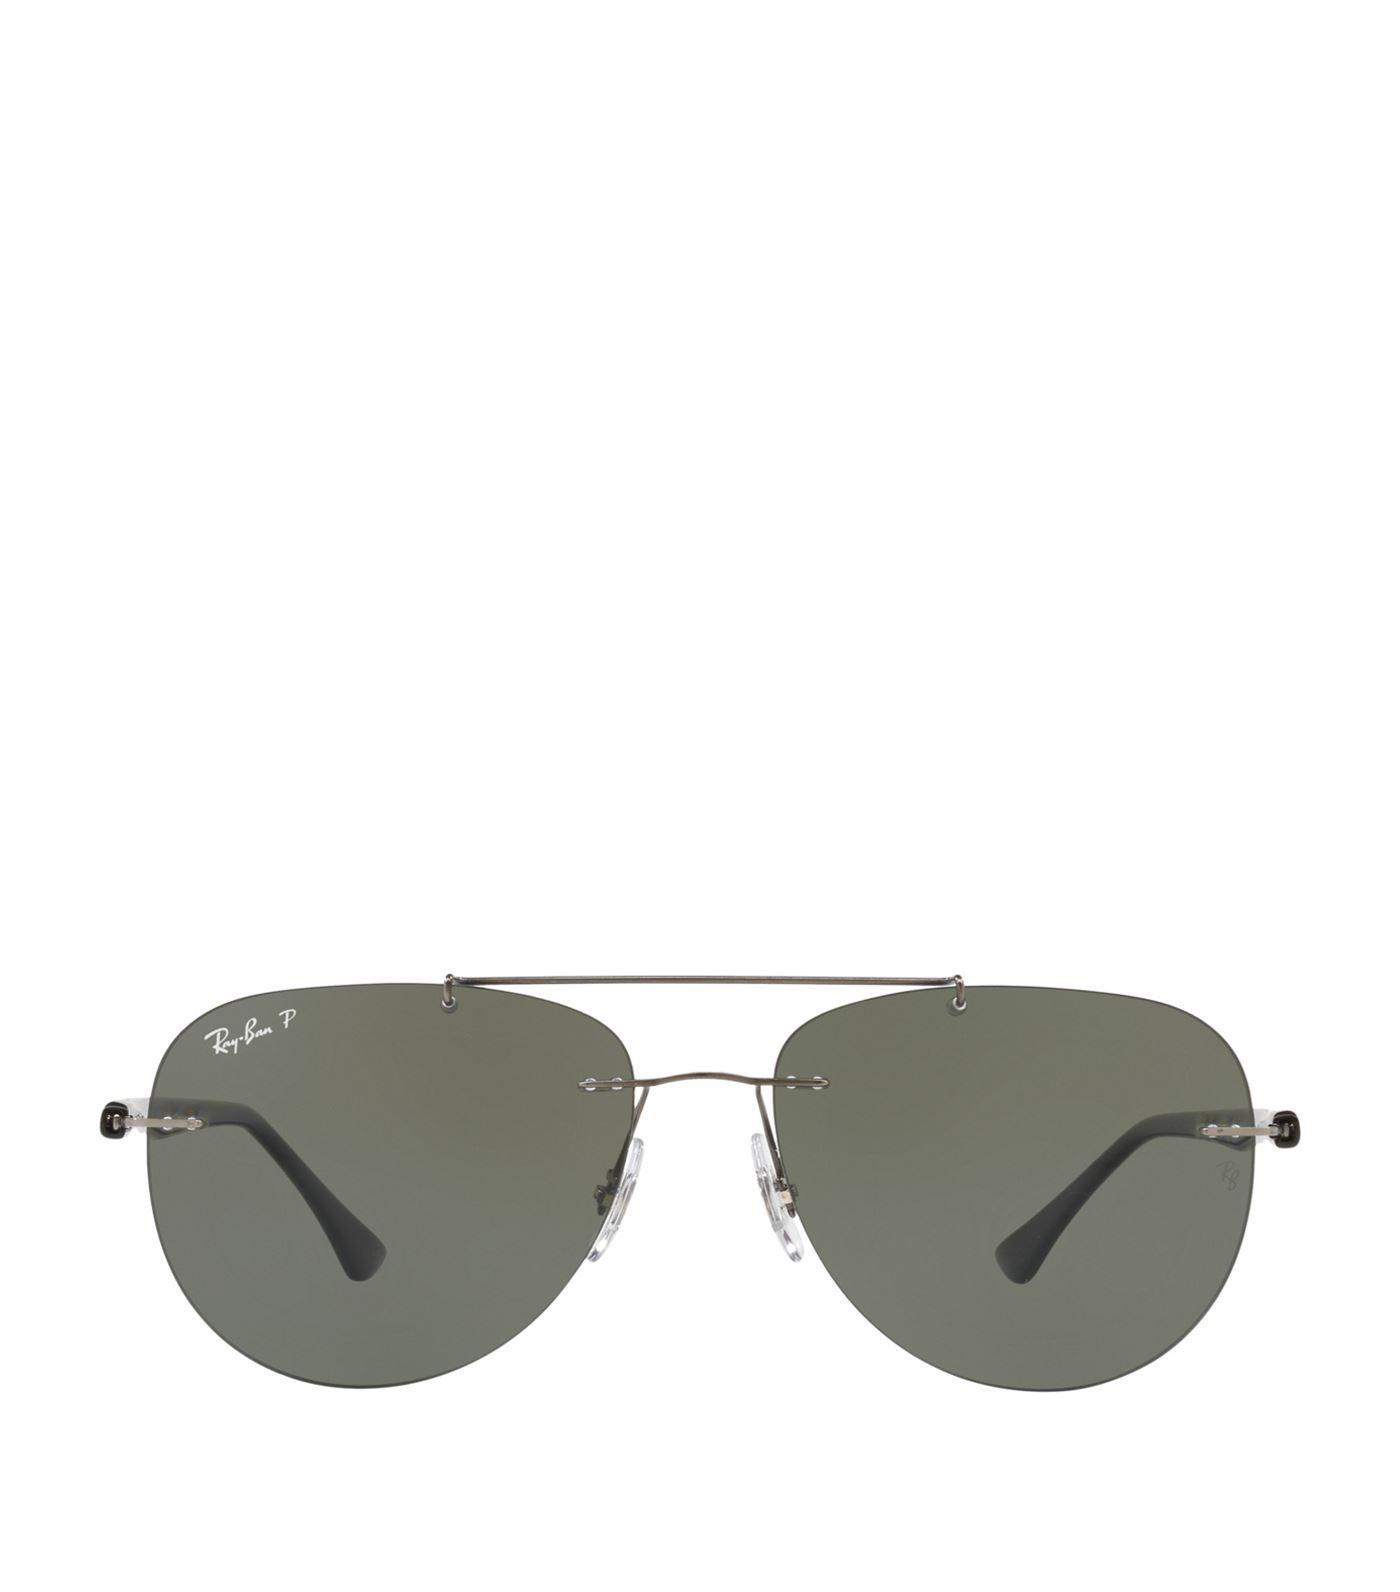 dfd4c706954 Ray Ban Phantos 57Mm Polarized Rimless Aviator Sunglasses - Polar Gunmetal  In Green